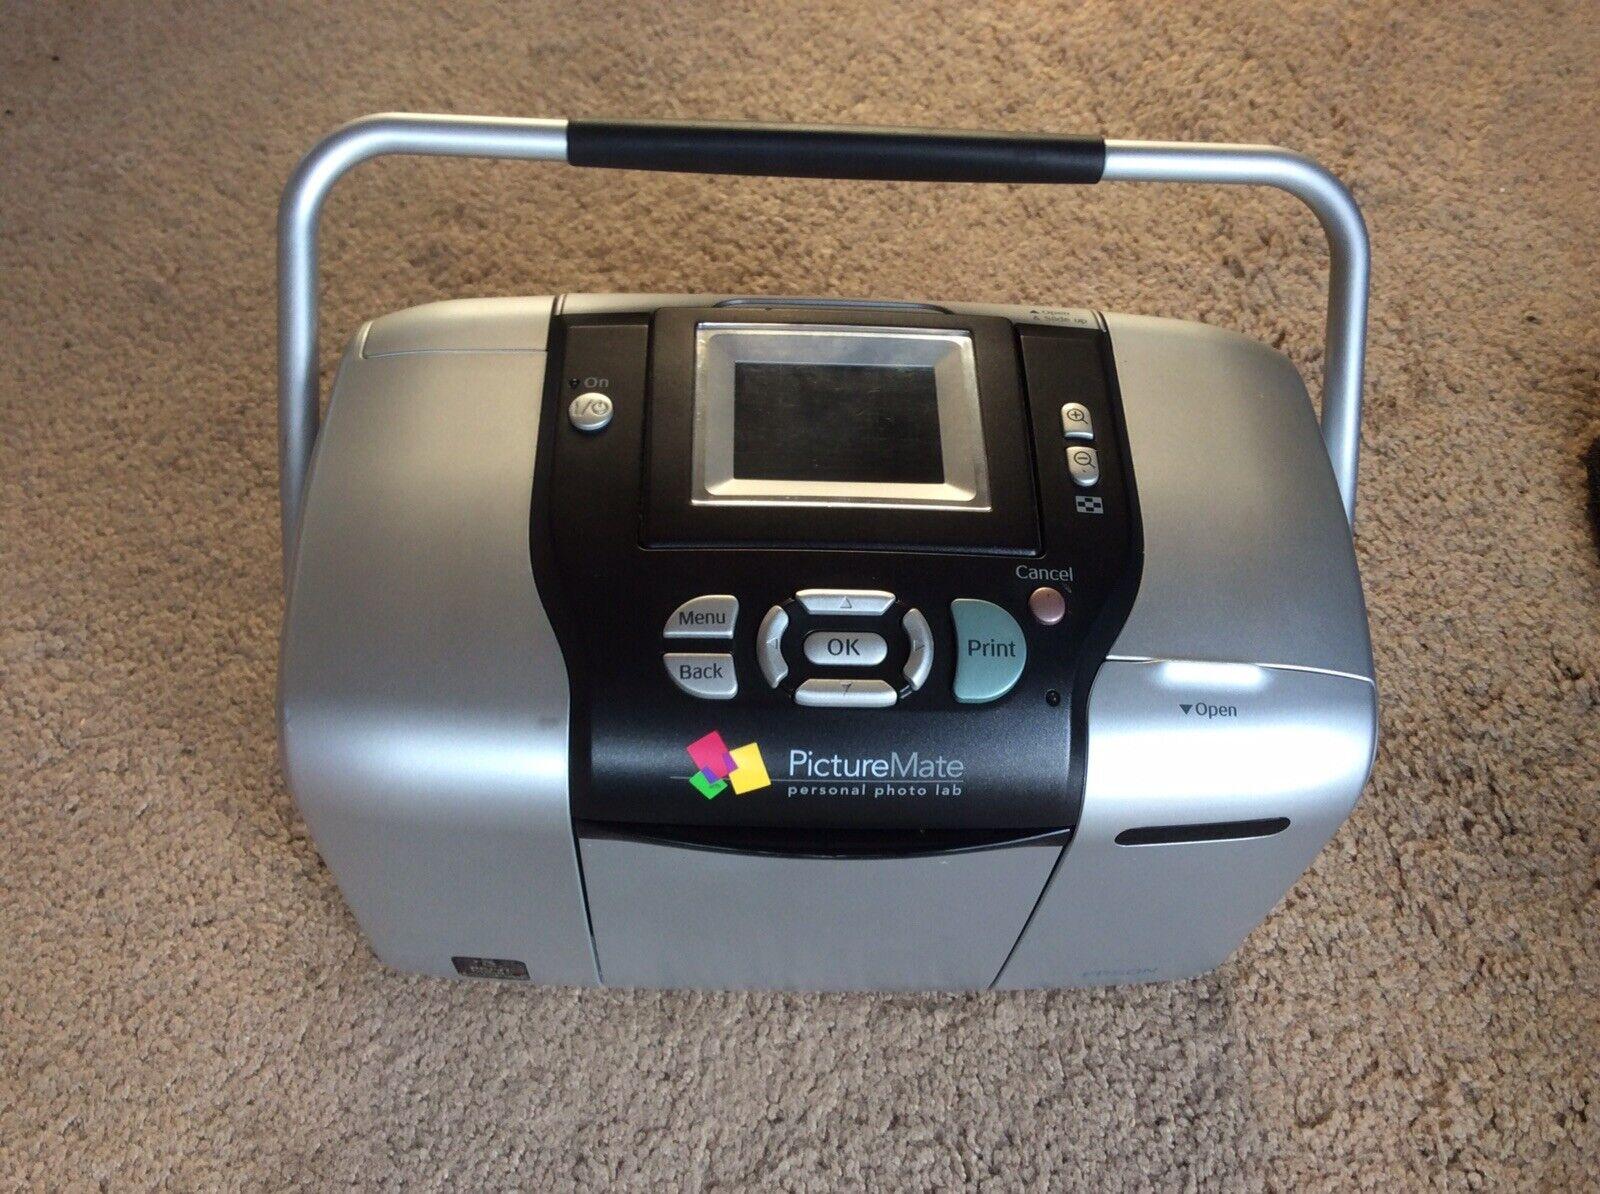 Epson Picturemate 500 Digital Photo Inkjet Printer For Sale Online Ebay